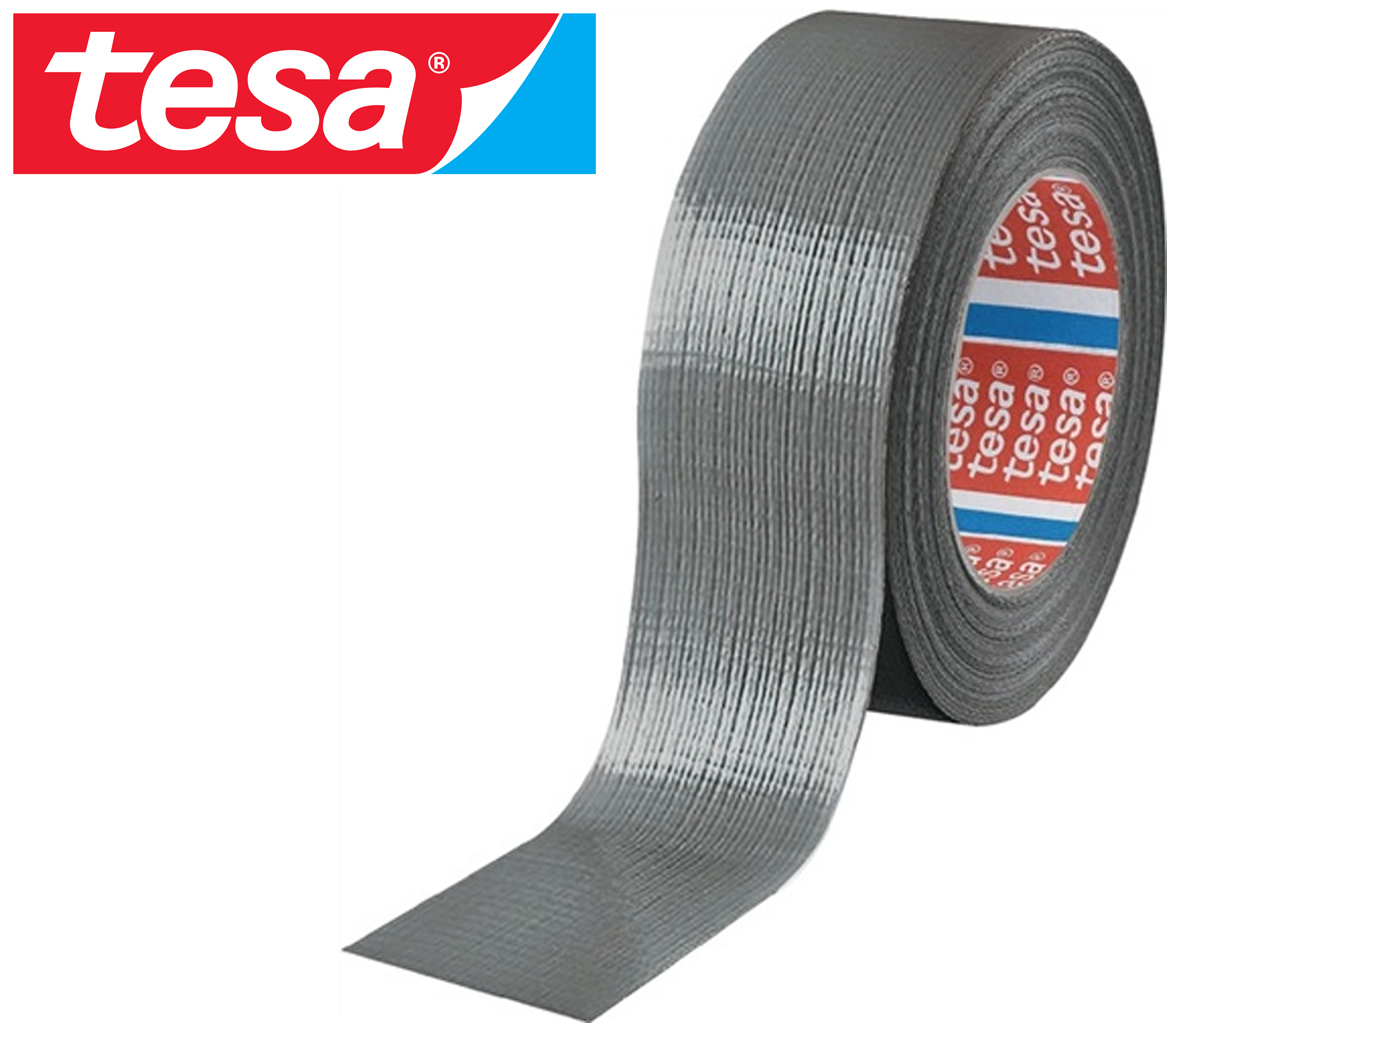 tape tesa 4662 PE gecoat   DKMTools - DKM Tools